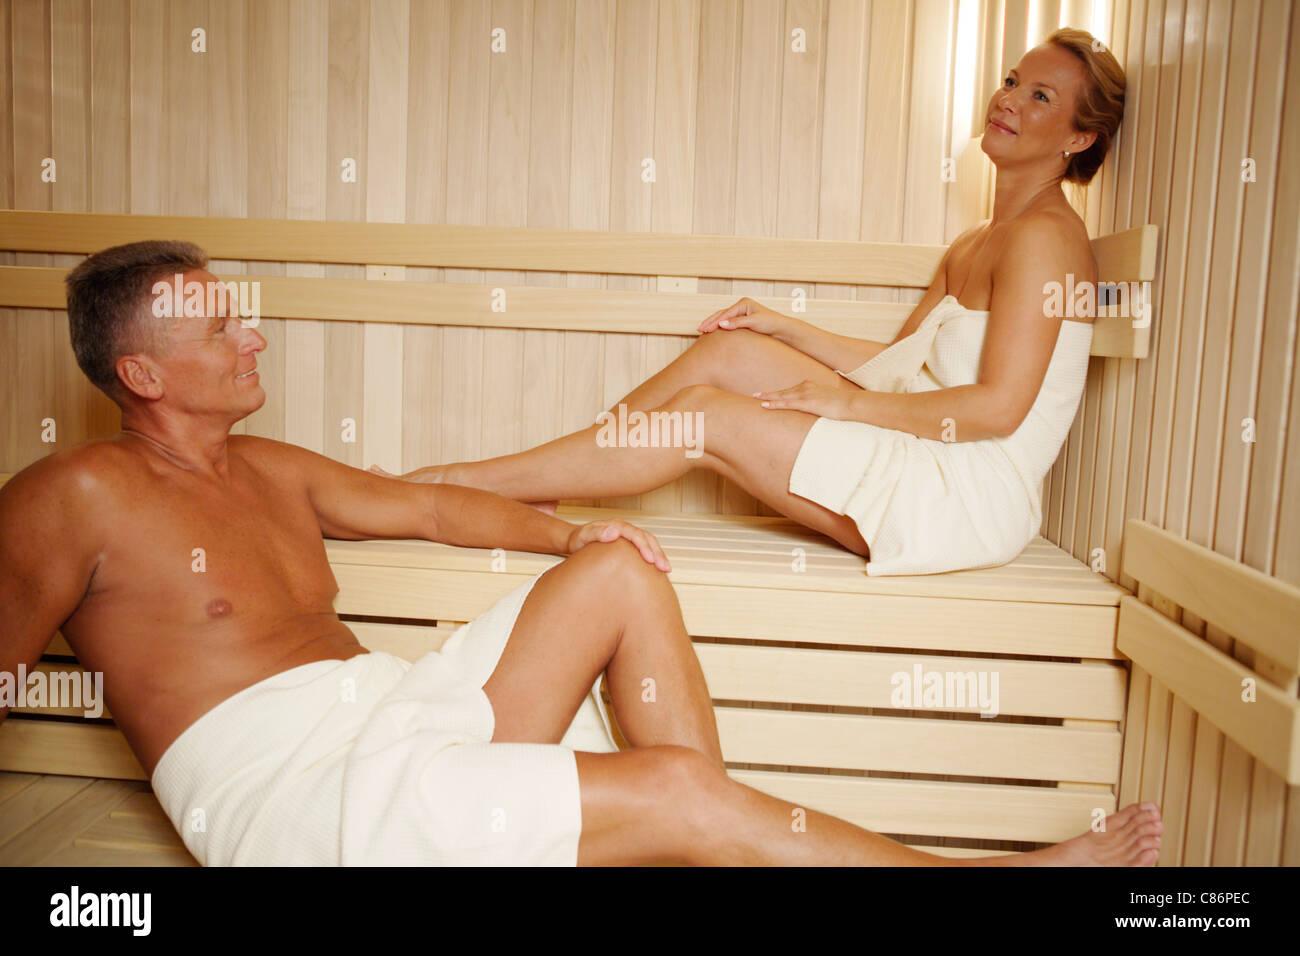 Couple in sauna - Stock Image